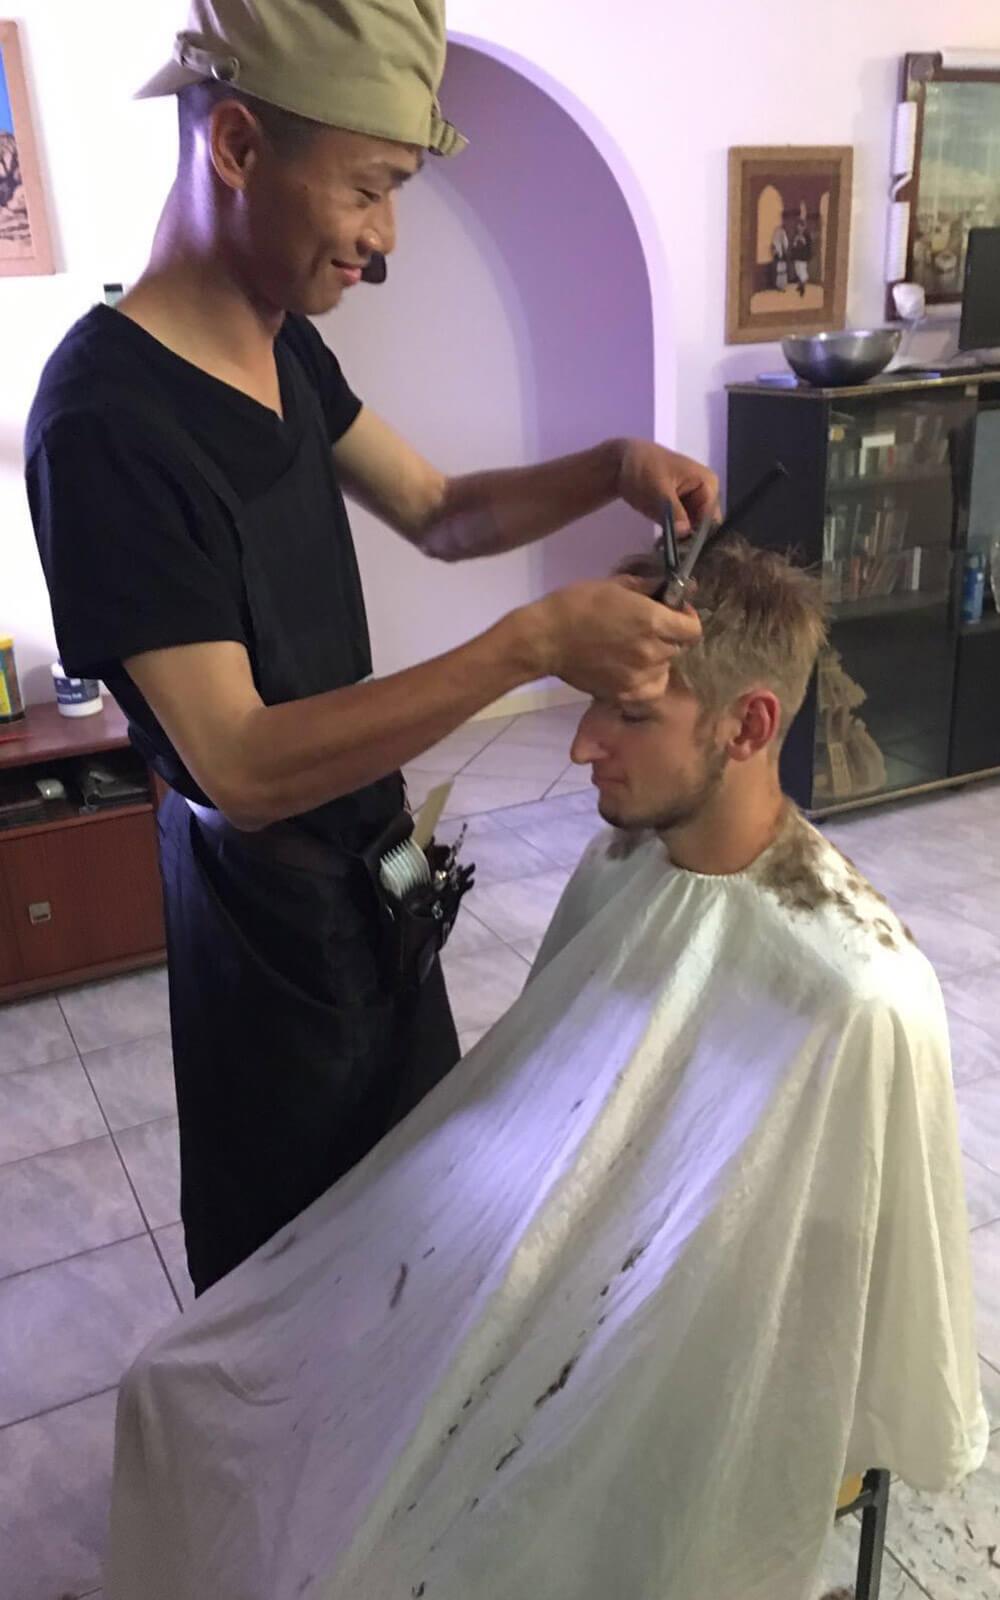 Paul lässt sich einen neuen Haarschnitt verpassen